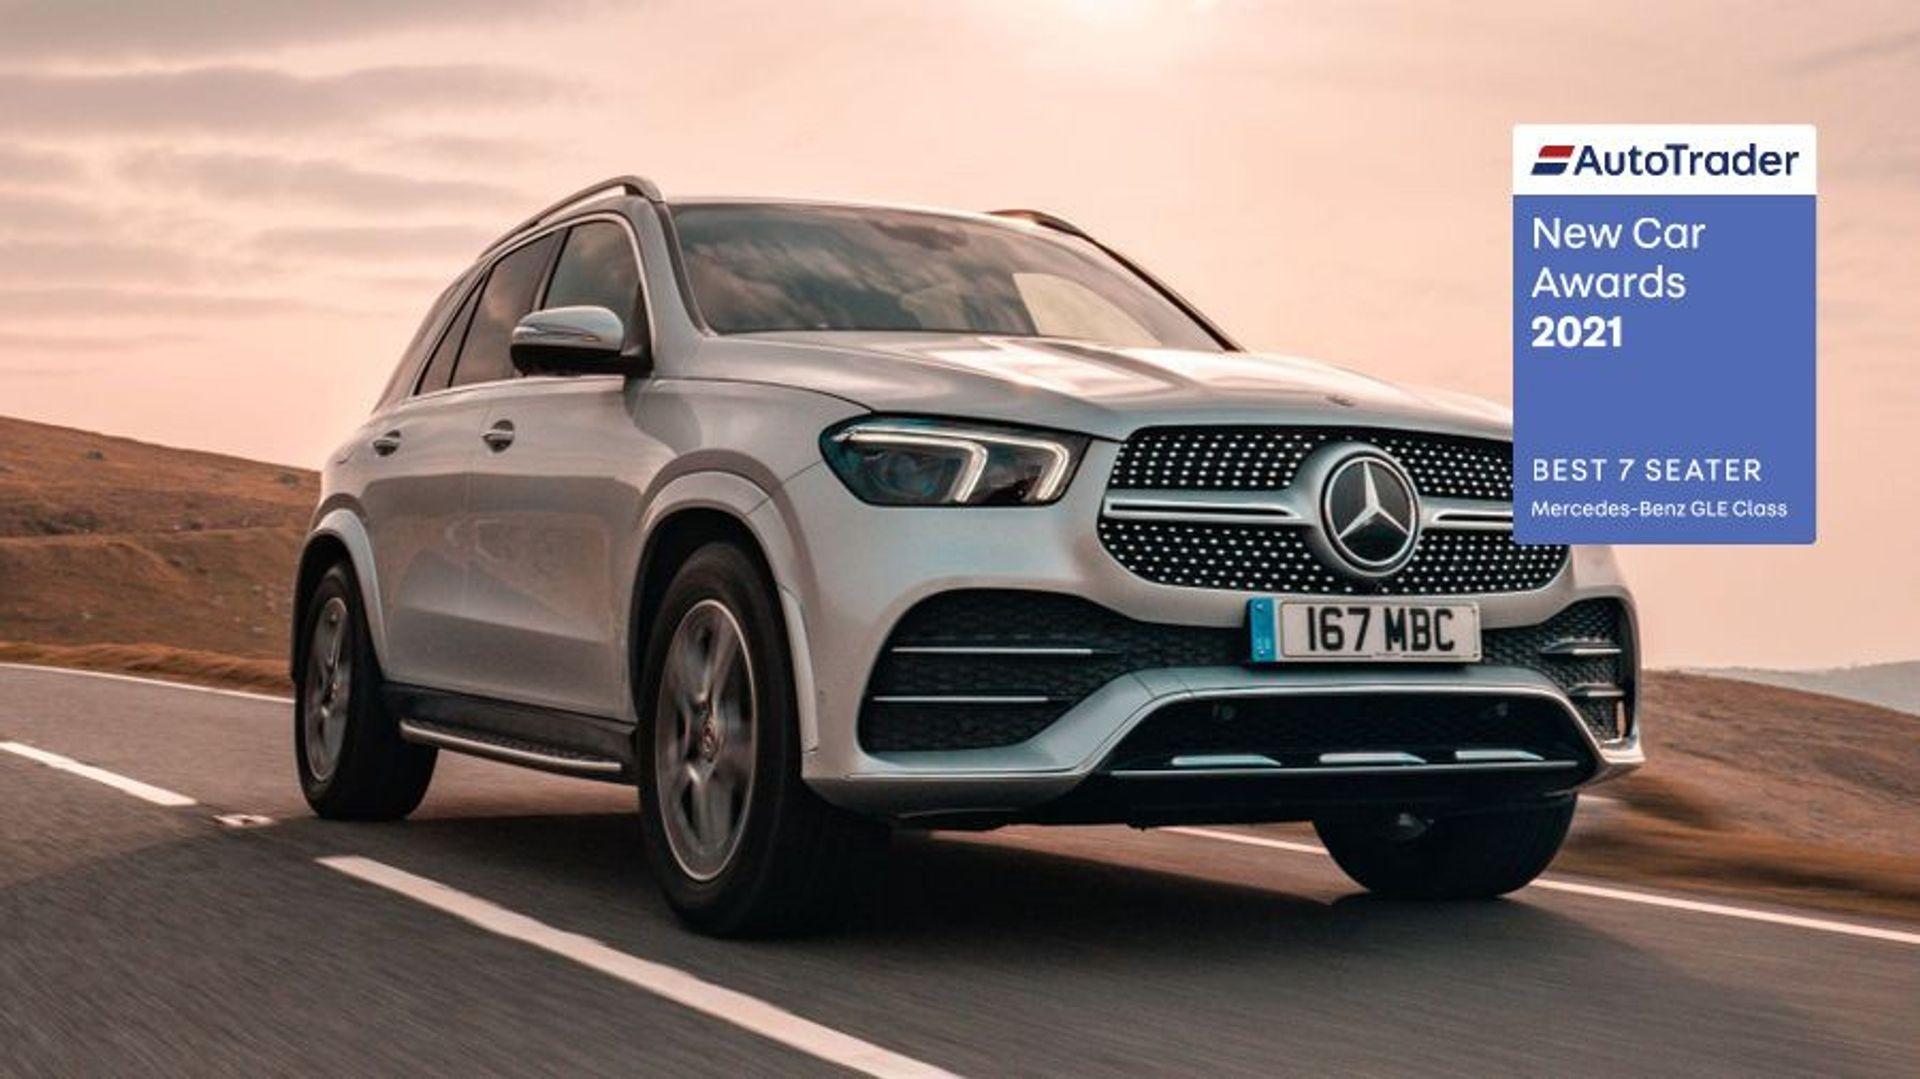 Mercedes-Benz GLE Class  image